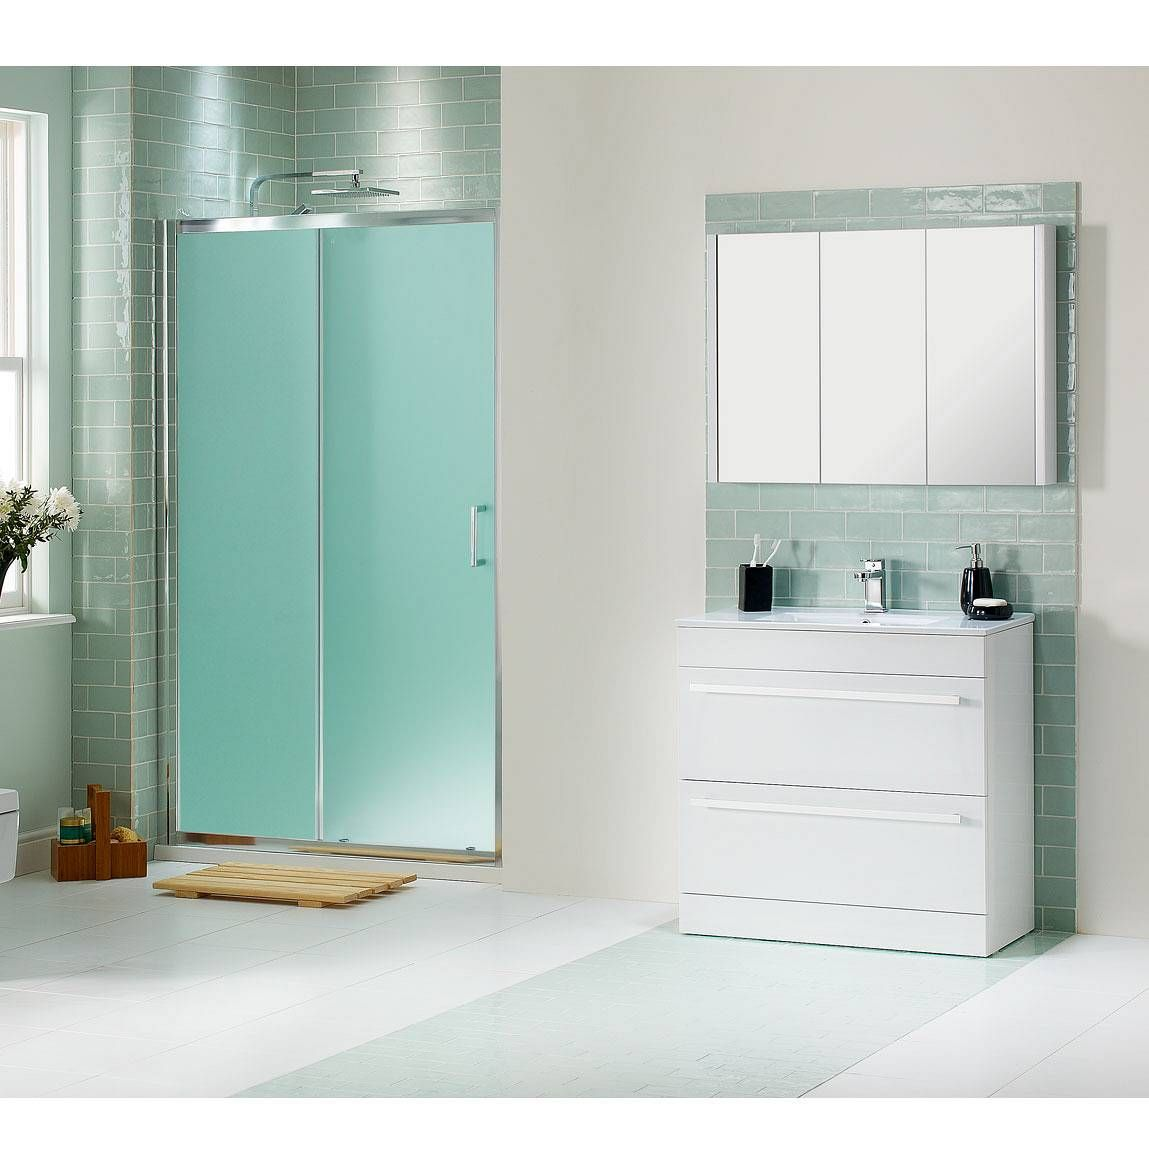 buy shower glass doors   Design   Pinterest   Shower doors, Frosted ...